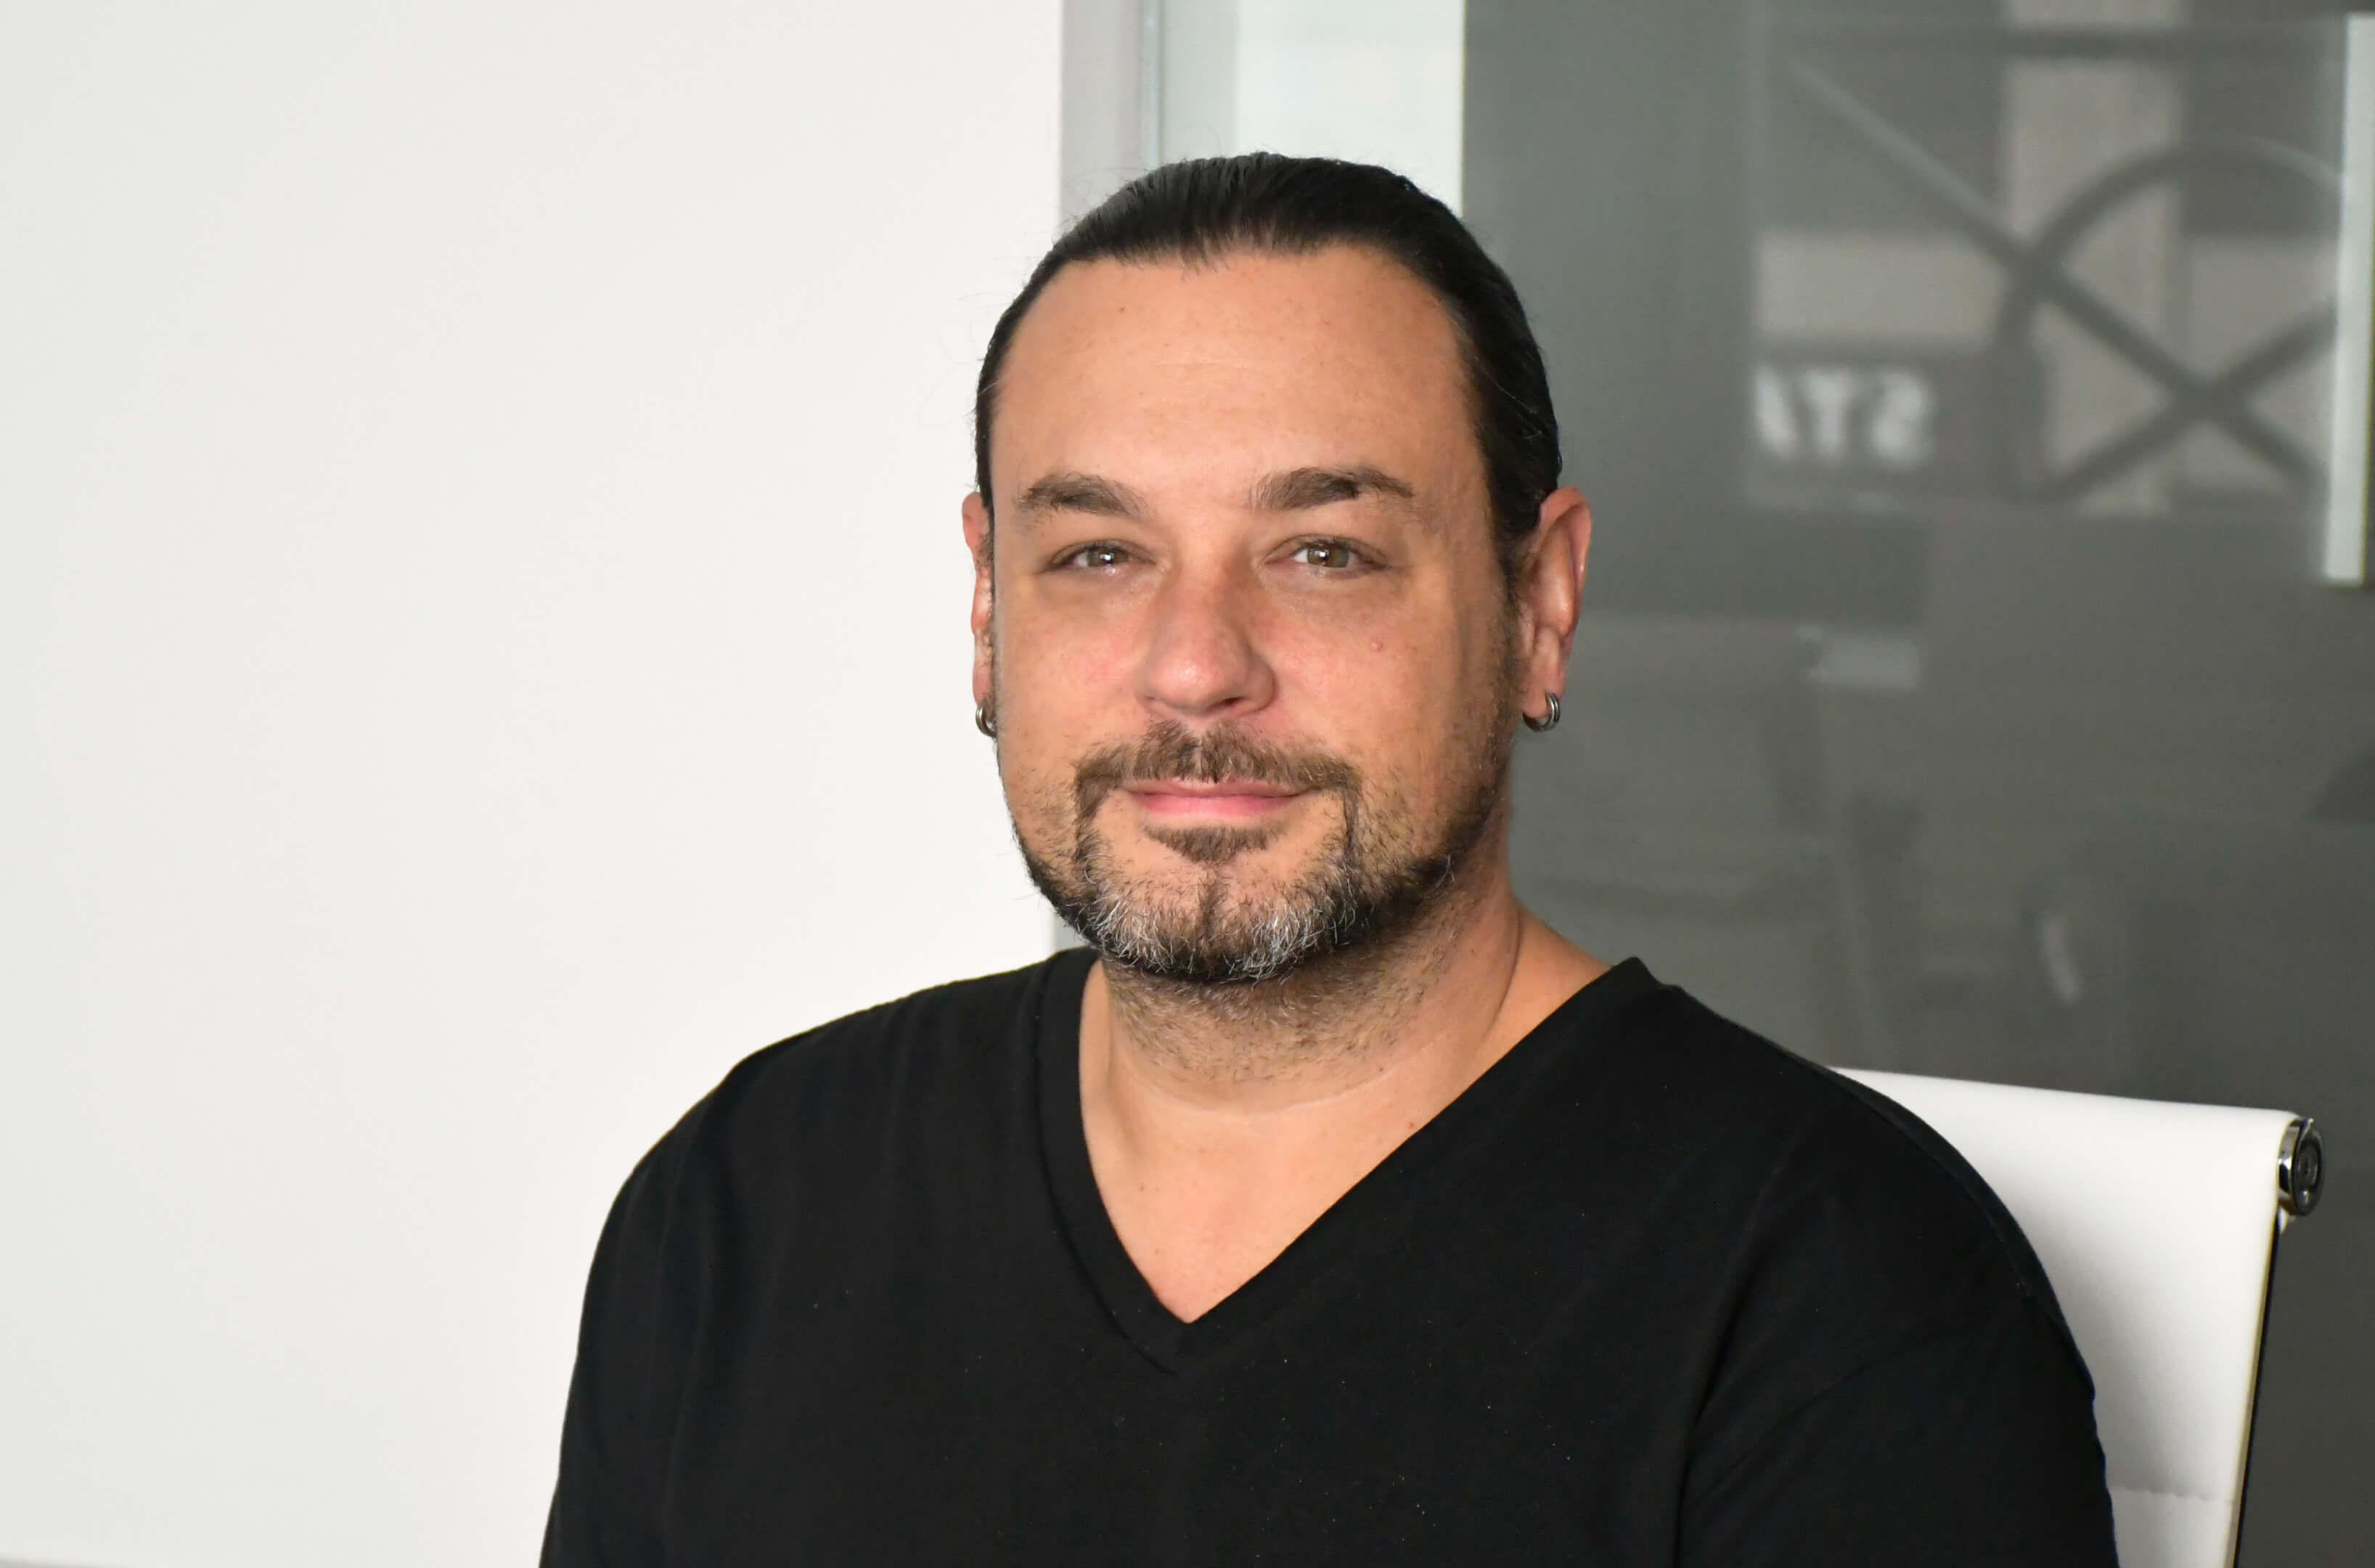 Dwight Zahringer